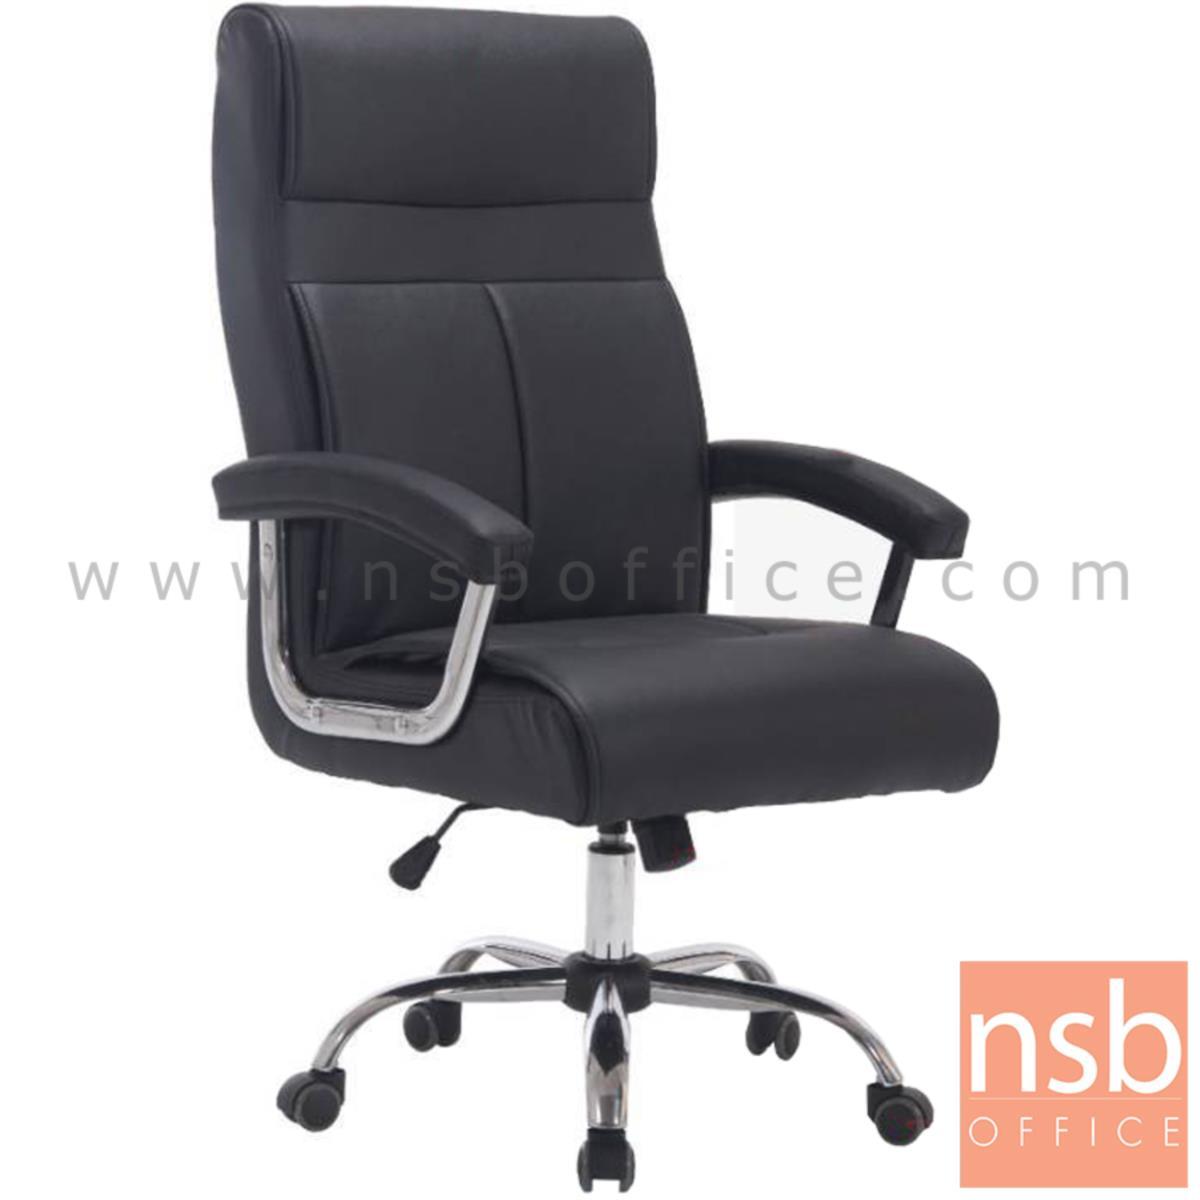 B01A504:เก้าอี้ผู้บริหาร รุ่น WHALE (เวล)  โช๊คแก๊ส มีก้อนโยก ขาเหล็กชุบโครเมี่ยม